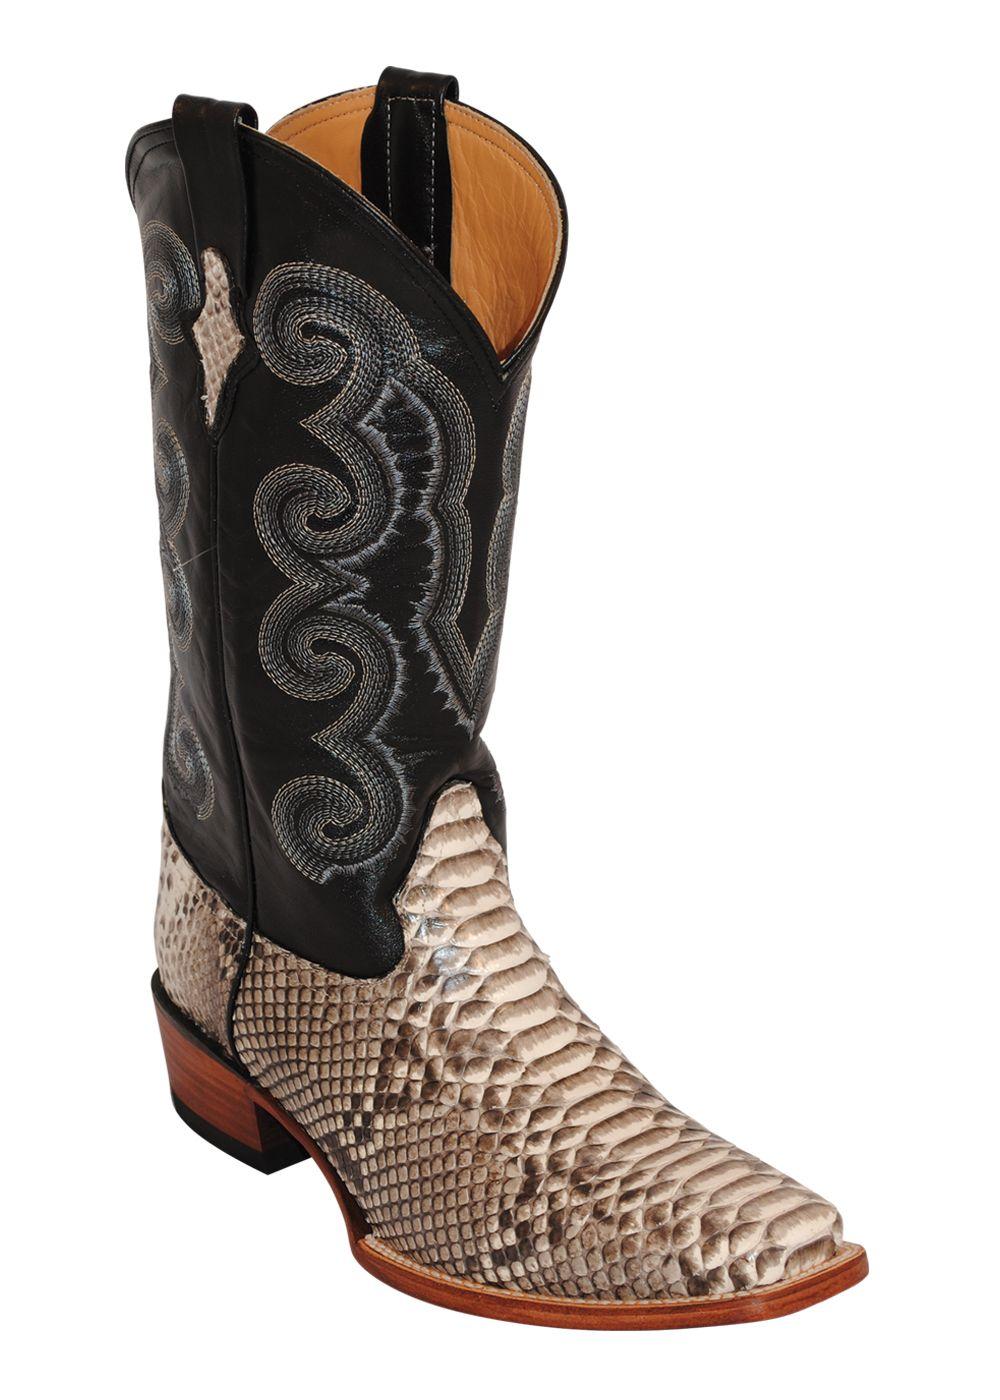 Ferrini USA Men's Natural Python D-toe Boots